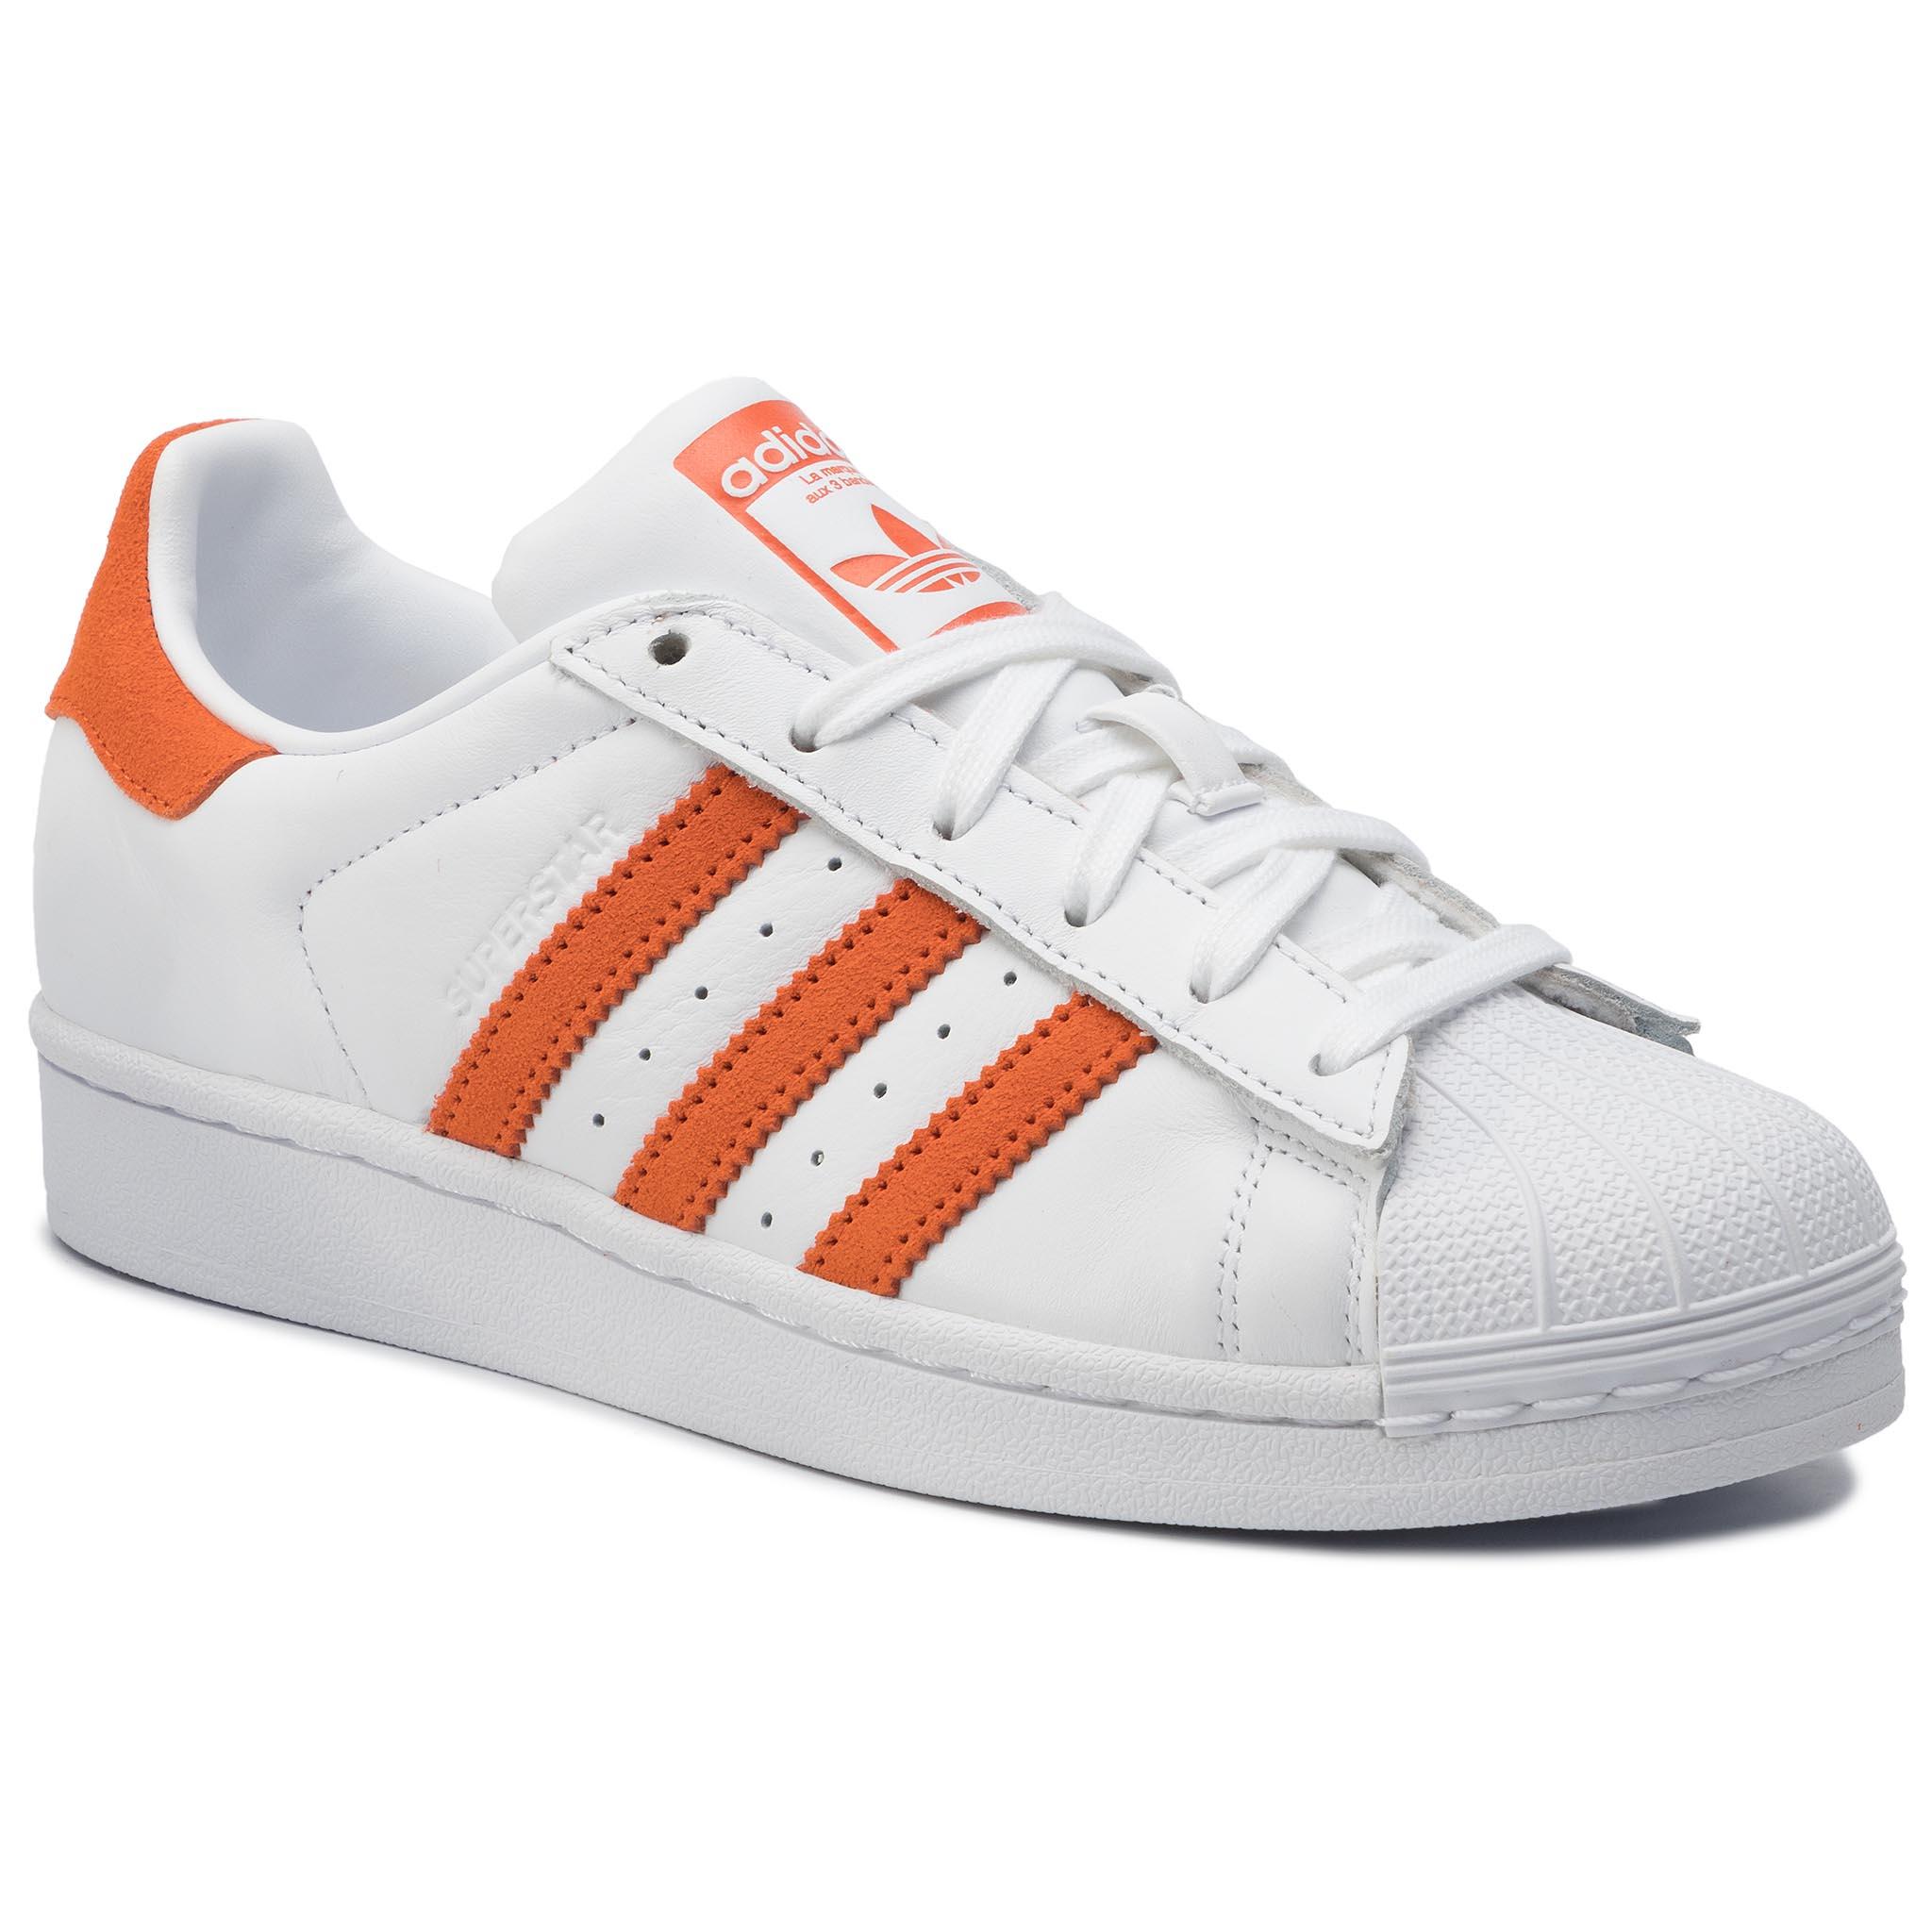 Topánky adidas - Superstar EE4472 Ftwwht/Orange/Ftwwht